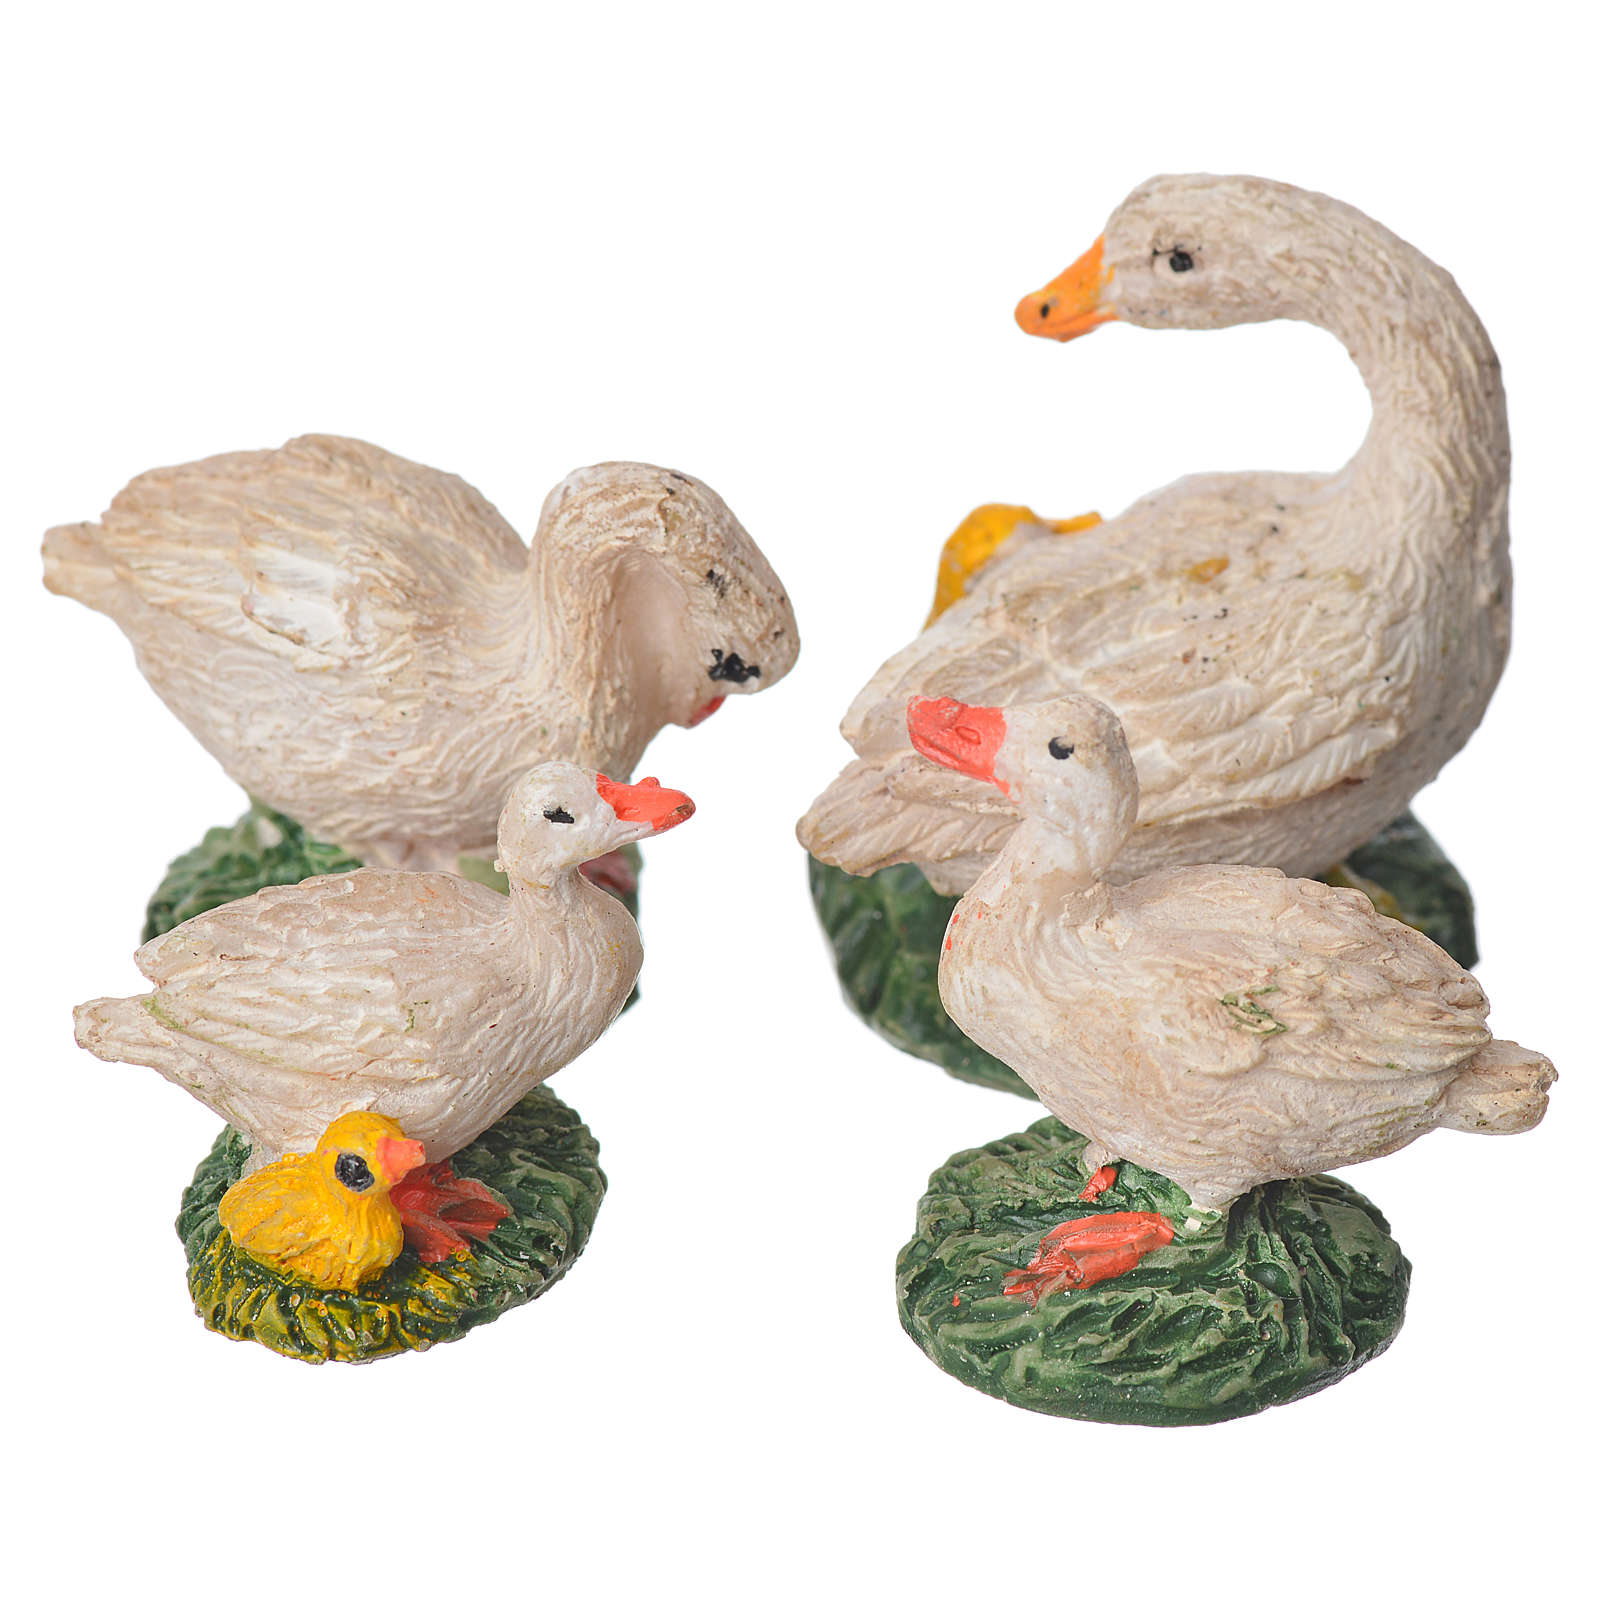 Nativity figurine, resin ducks, 4 pieces 10cm 3